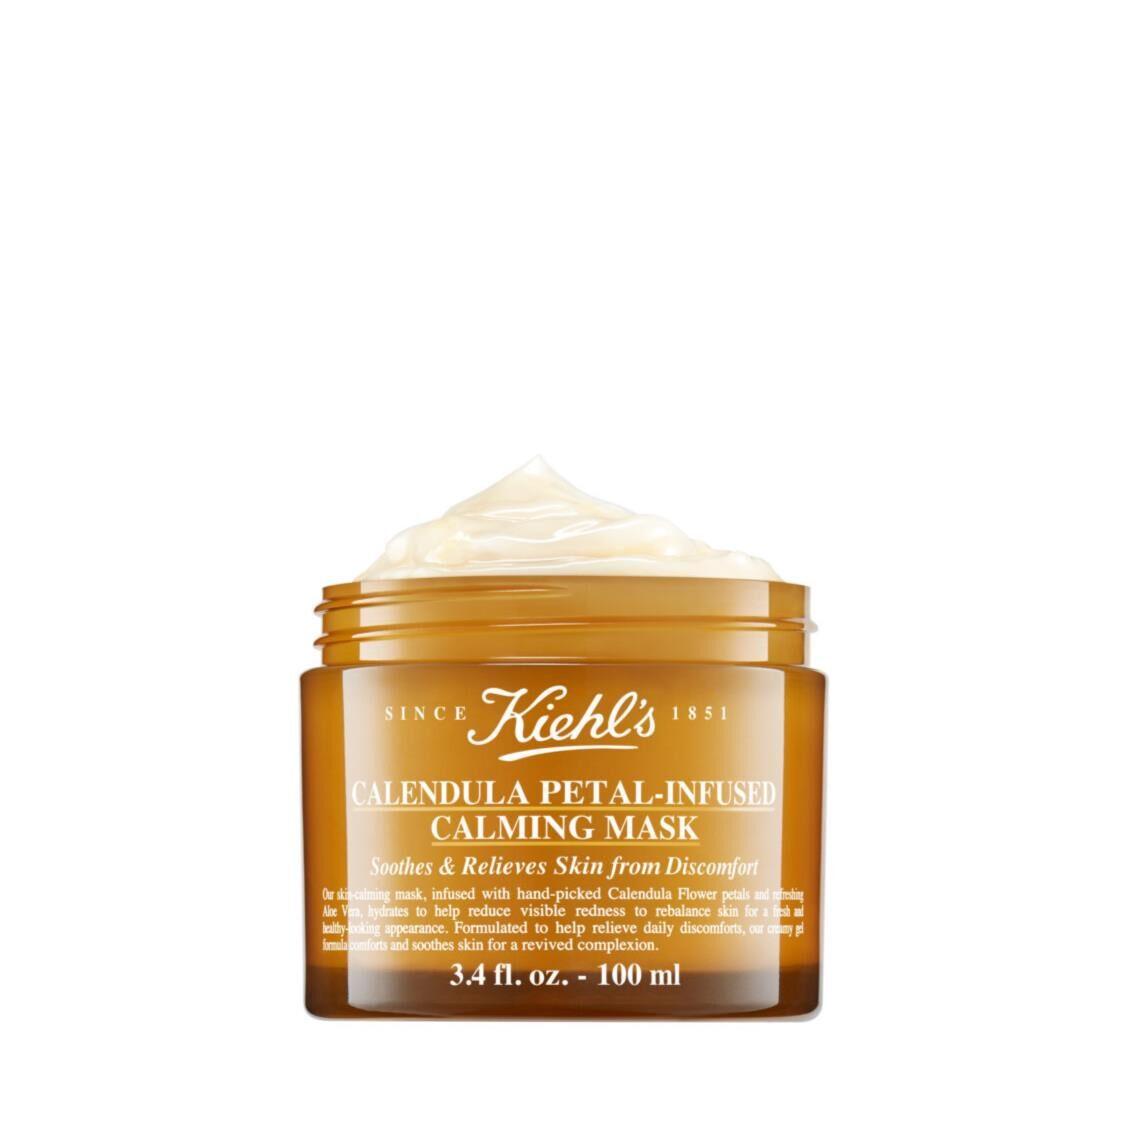 Kiehls Since 1851 Since 1851 Calendula Petal-Infused Calming Mask 100ml